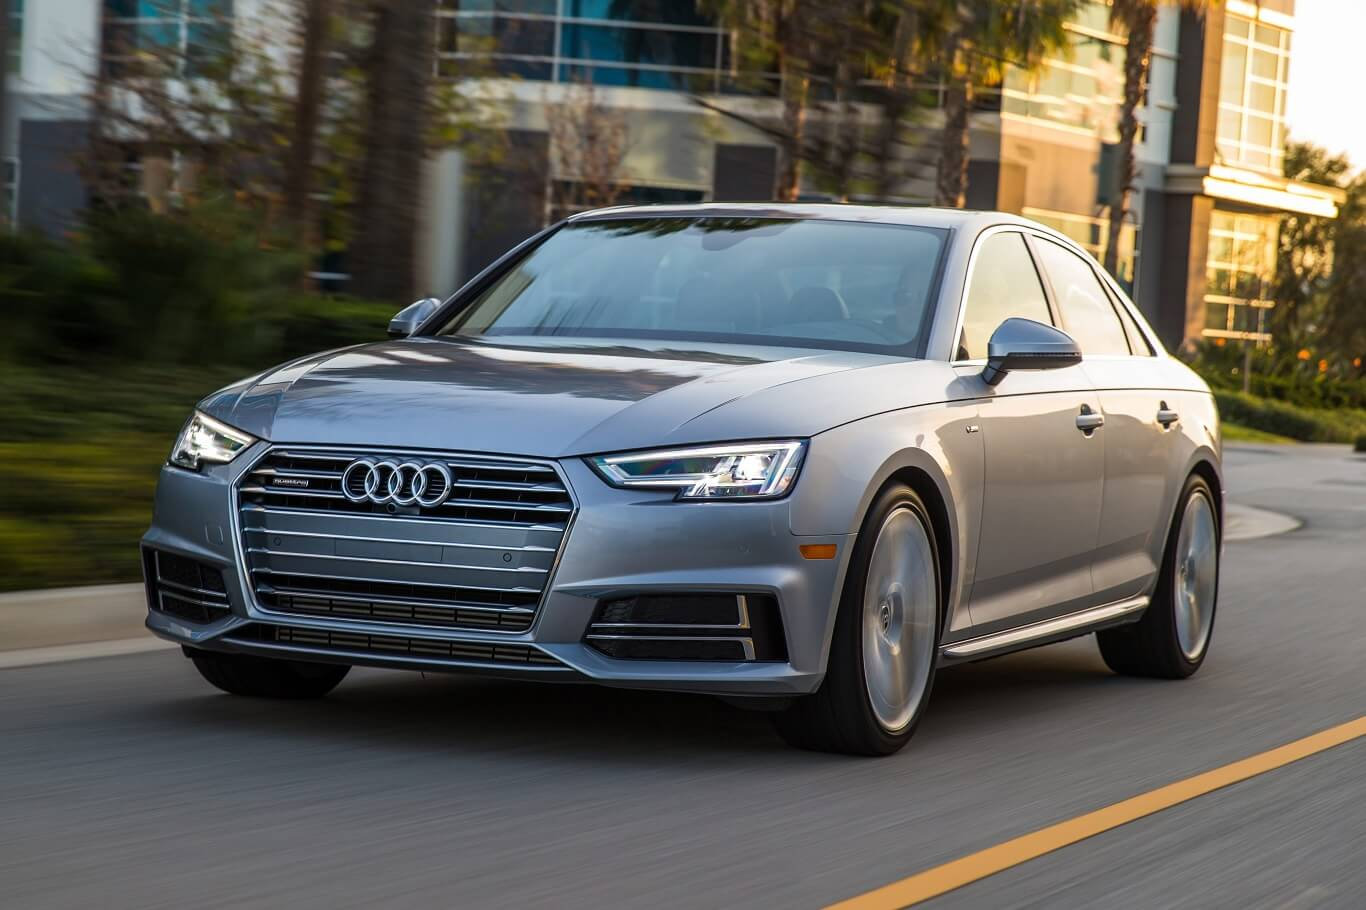 top 10 luxury cars under 50k